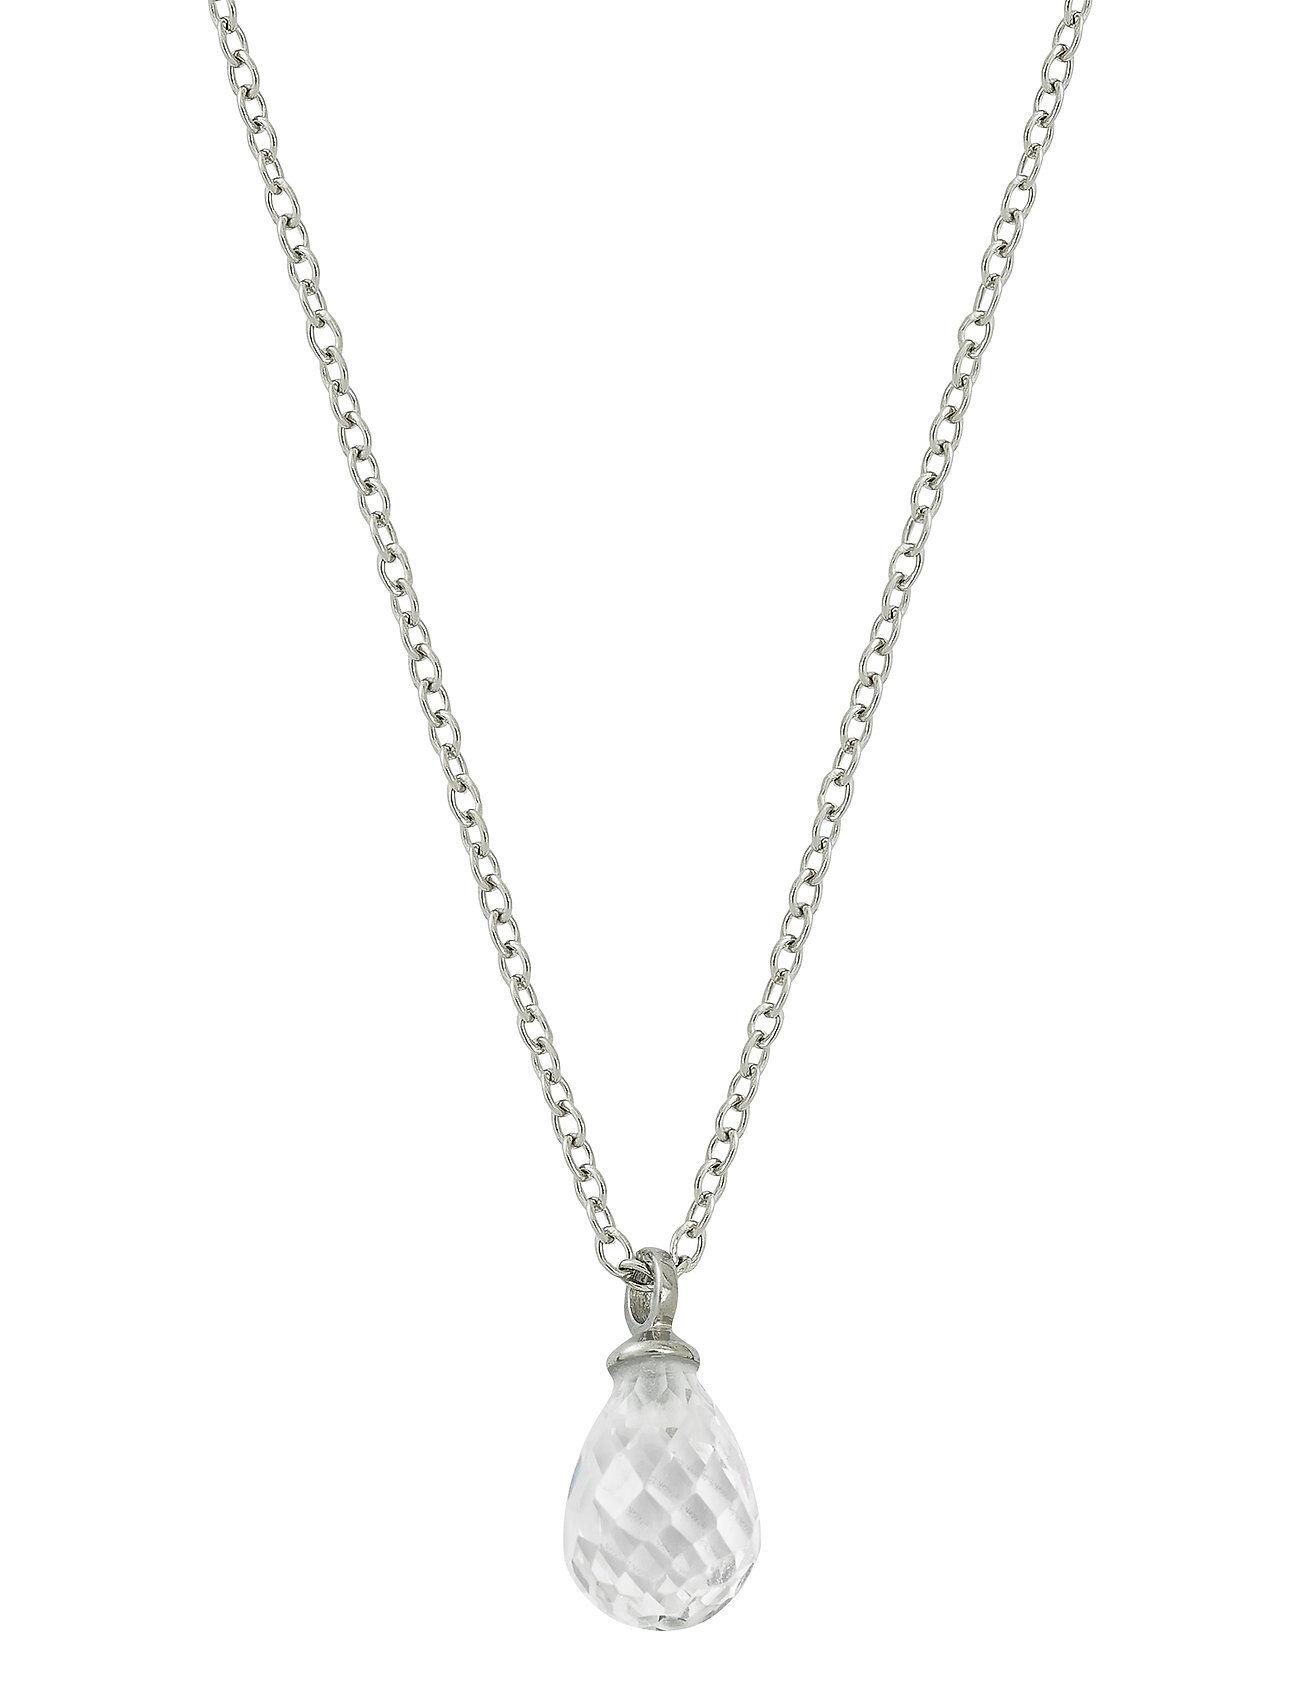 Edblad Drop Mini Necklace Cz Accessories Jewellery Necklaces Dainty Necklaces Hopea Edblad